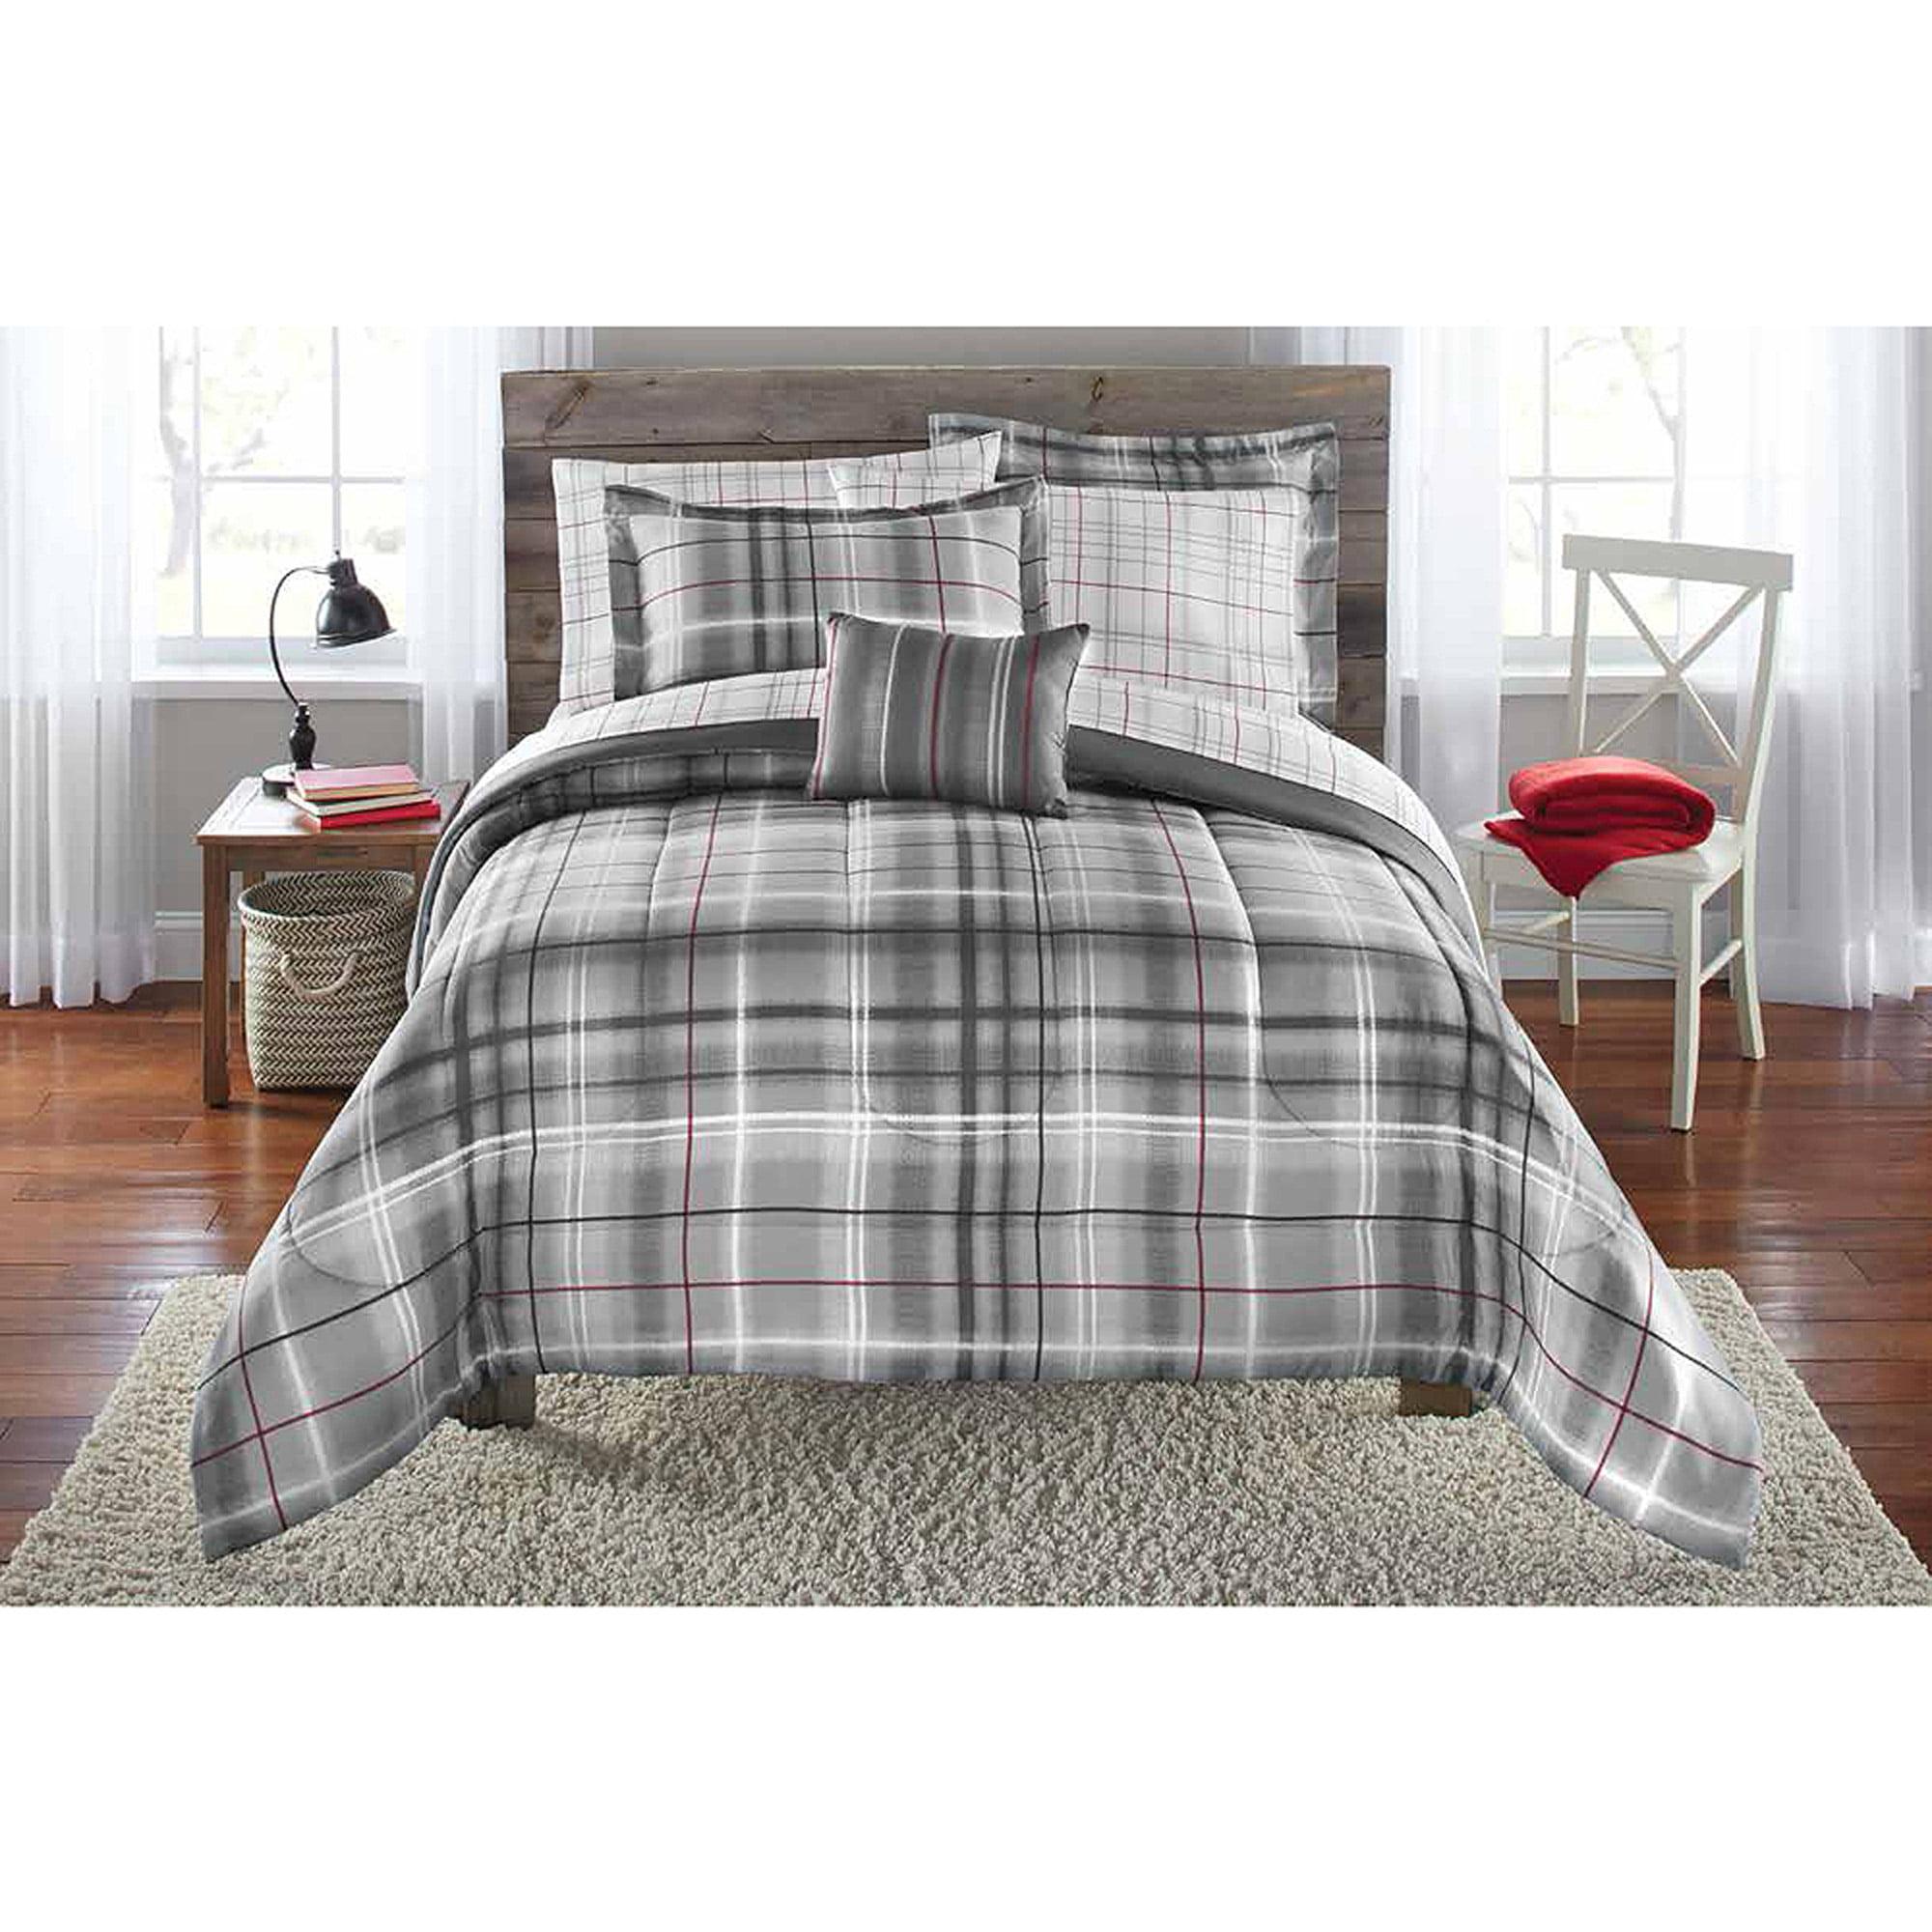 Mainstays Bed-in-a-Bag Bedding Comforter Set, Grey Plaid